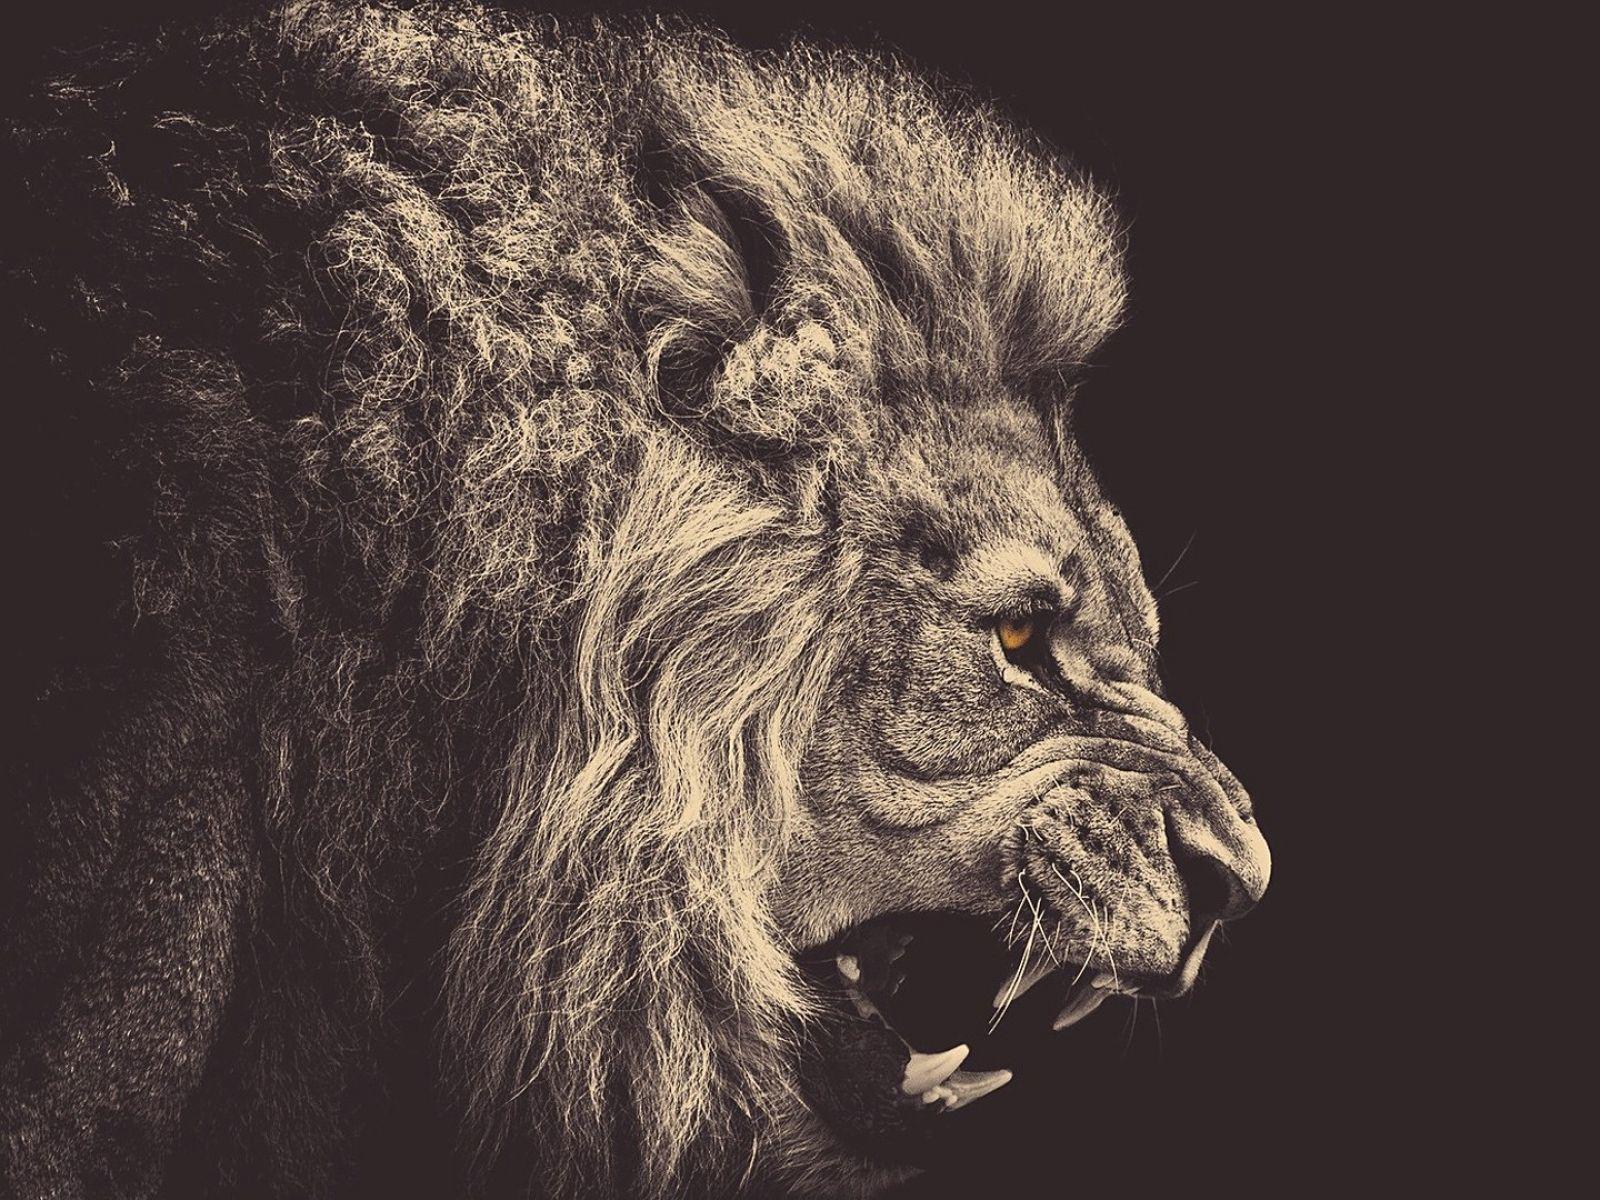 Black Dark Yellow Animals King Eyes Angry Lions Roar 1920x1080 Wallpaper Art HD